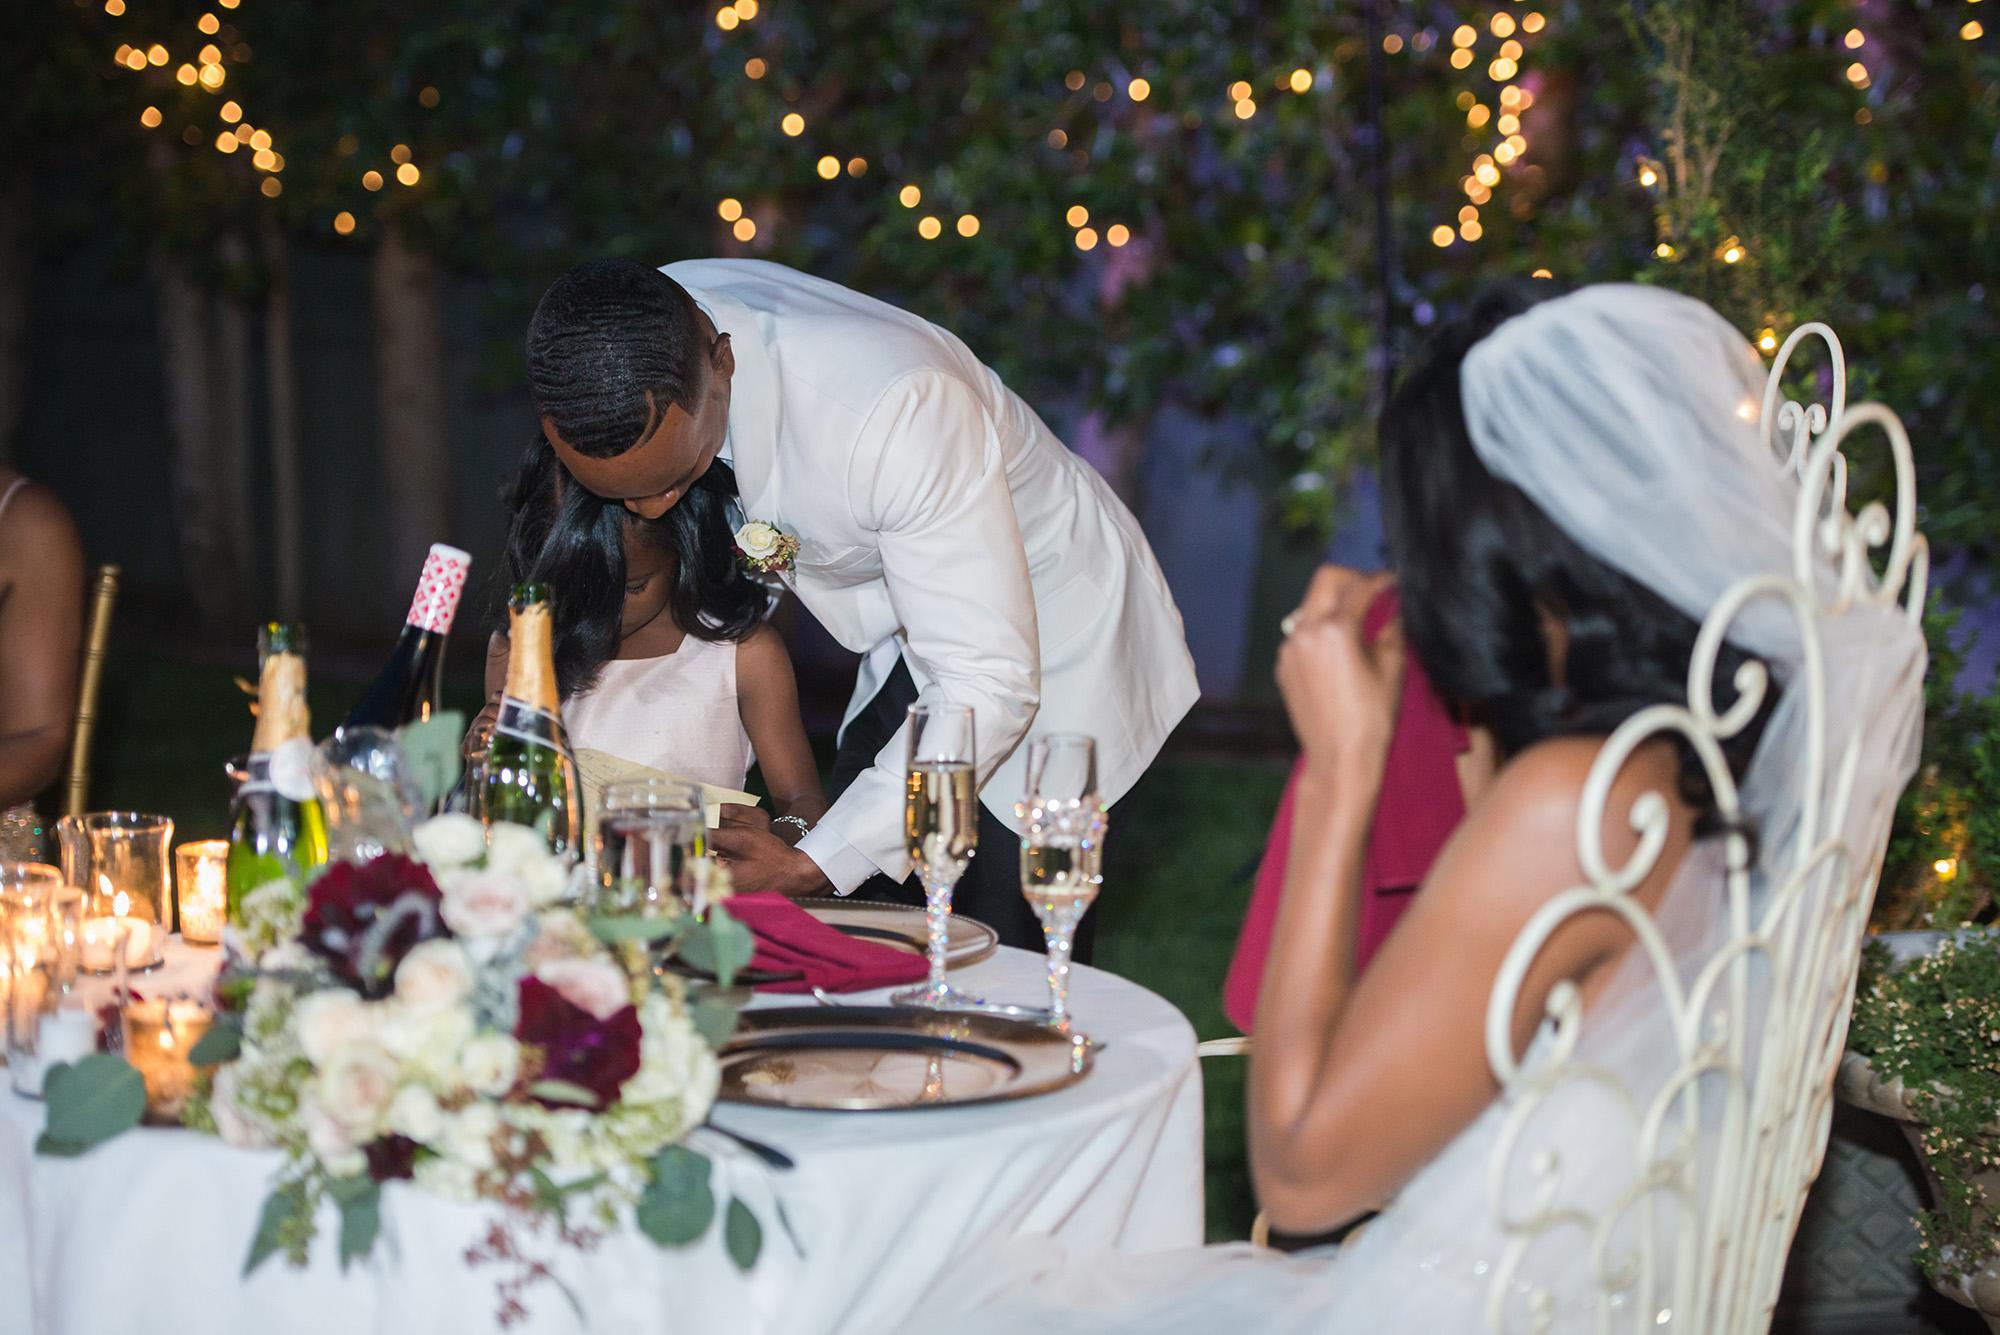 associate-photographer-christmas-house-wedding-carrie-vines-0126.jpg